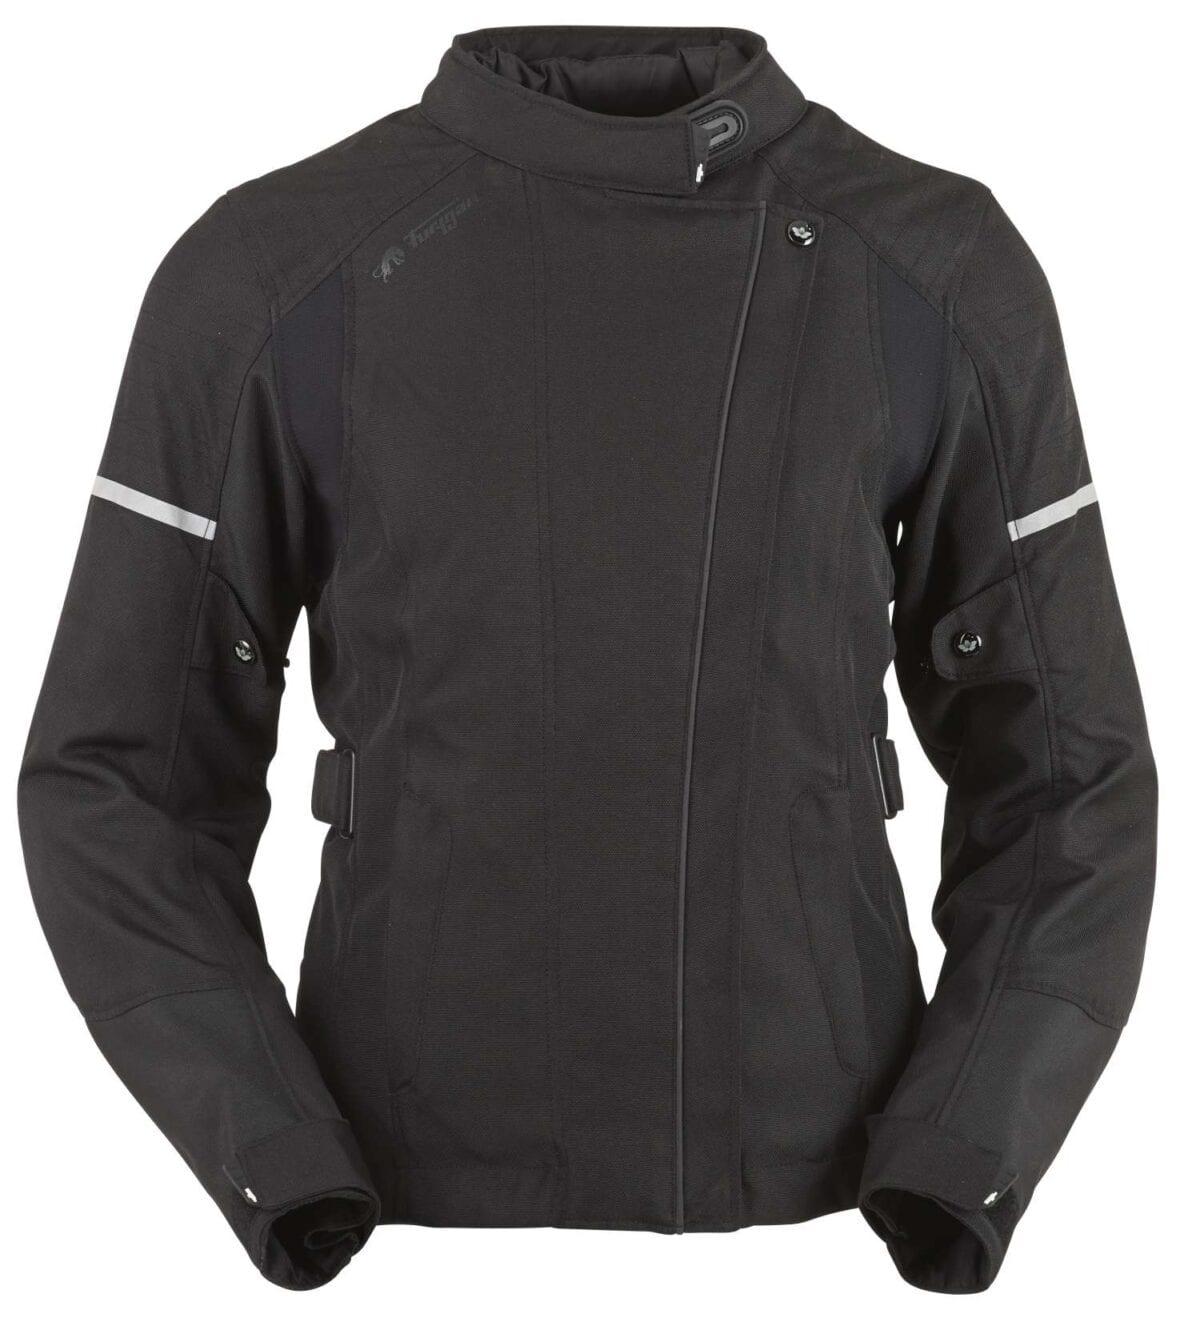 Furygan-elsa-jacket